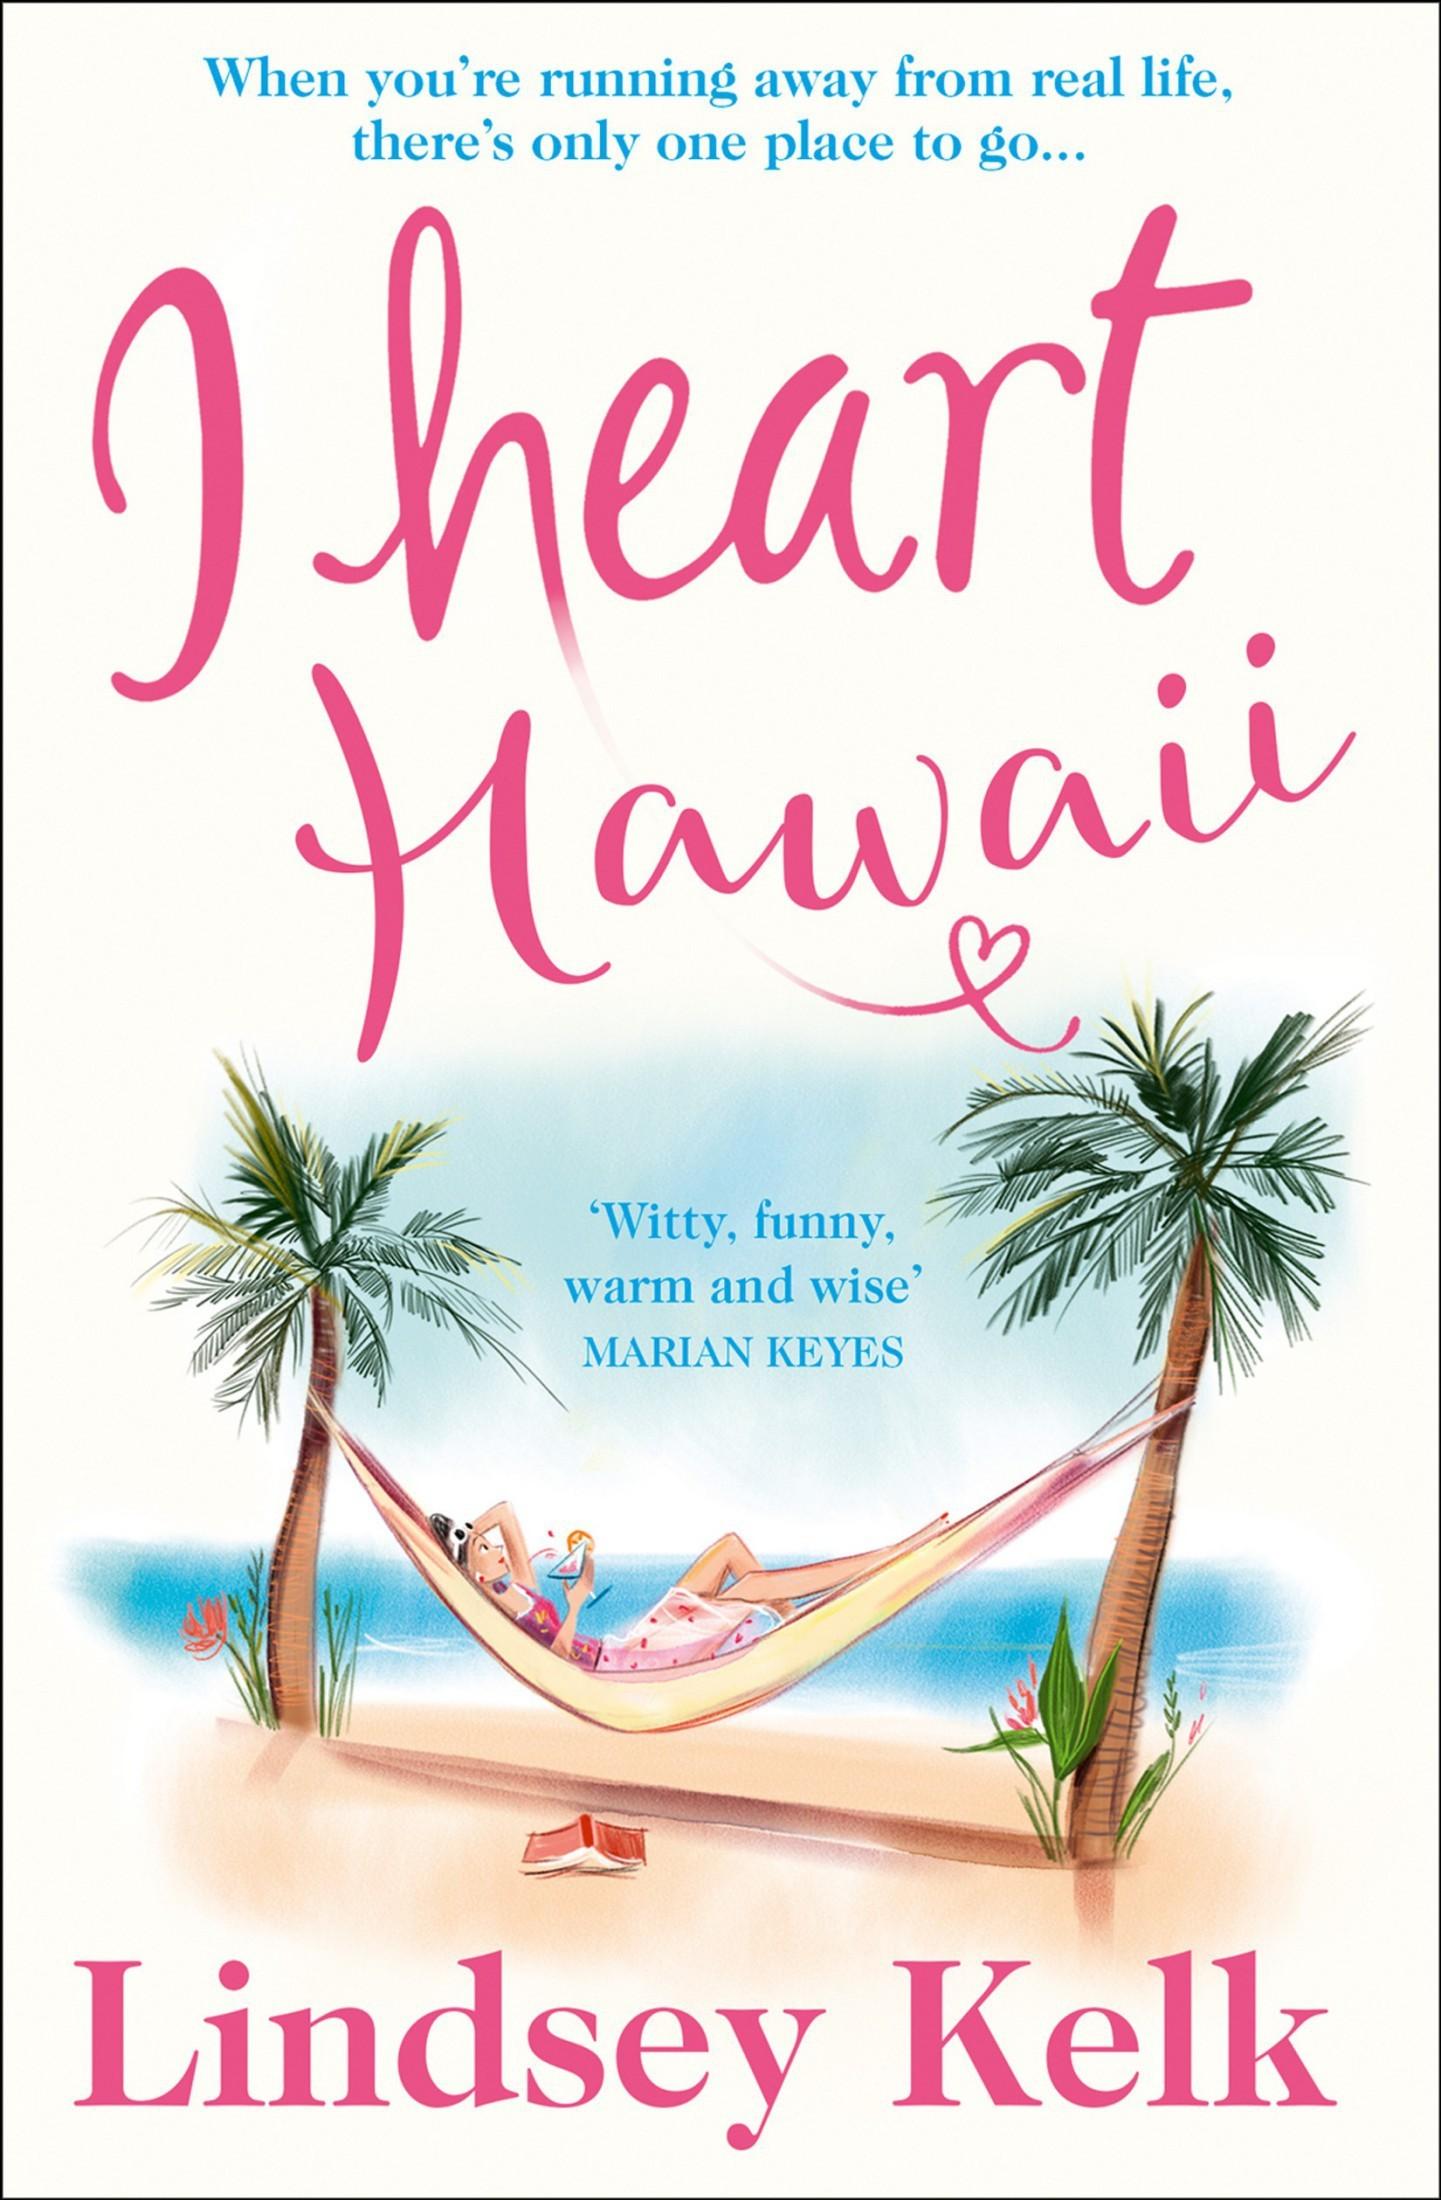 Lindsey Kelk - (I Heart 8) I Heart Hawaii